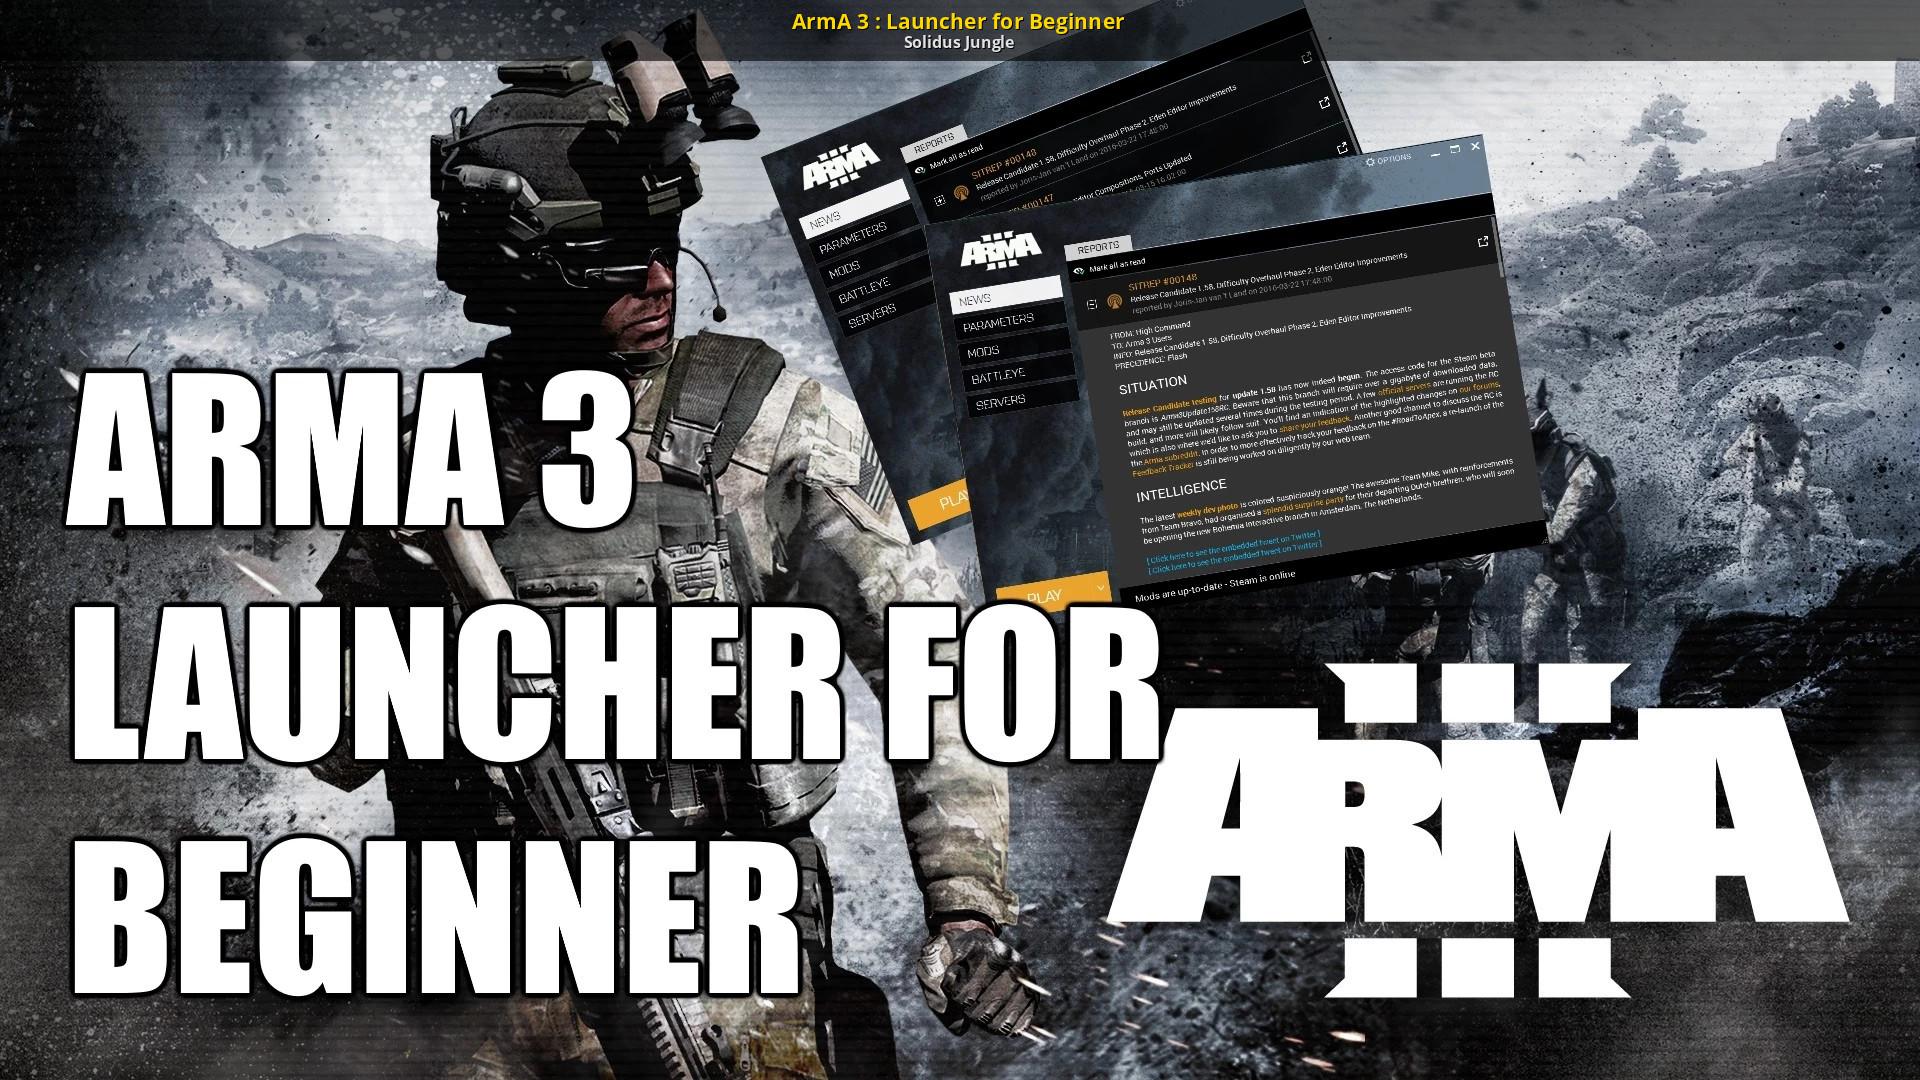 Arma 3 source code